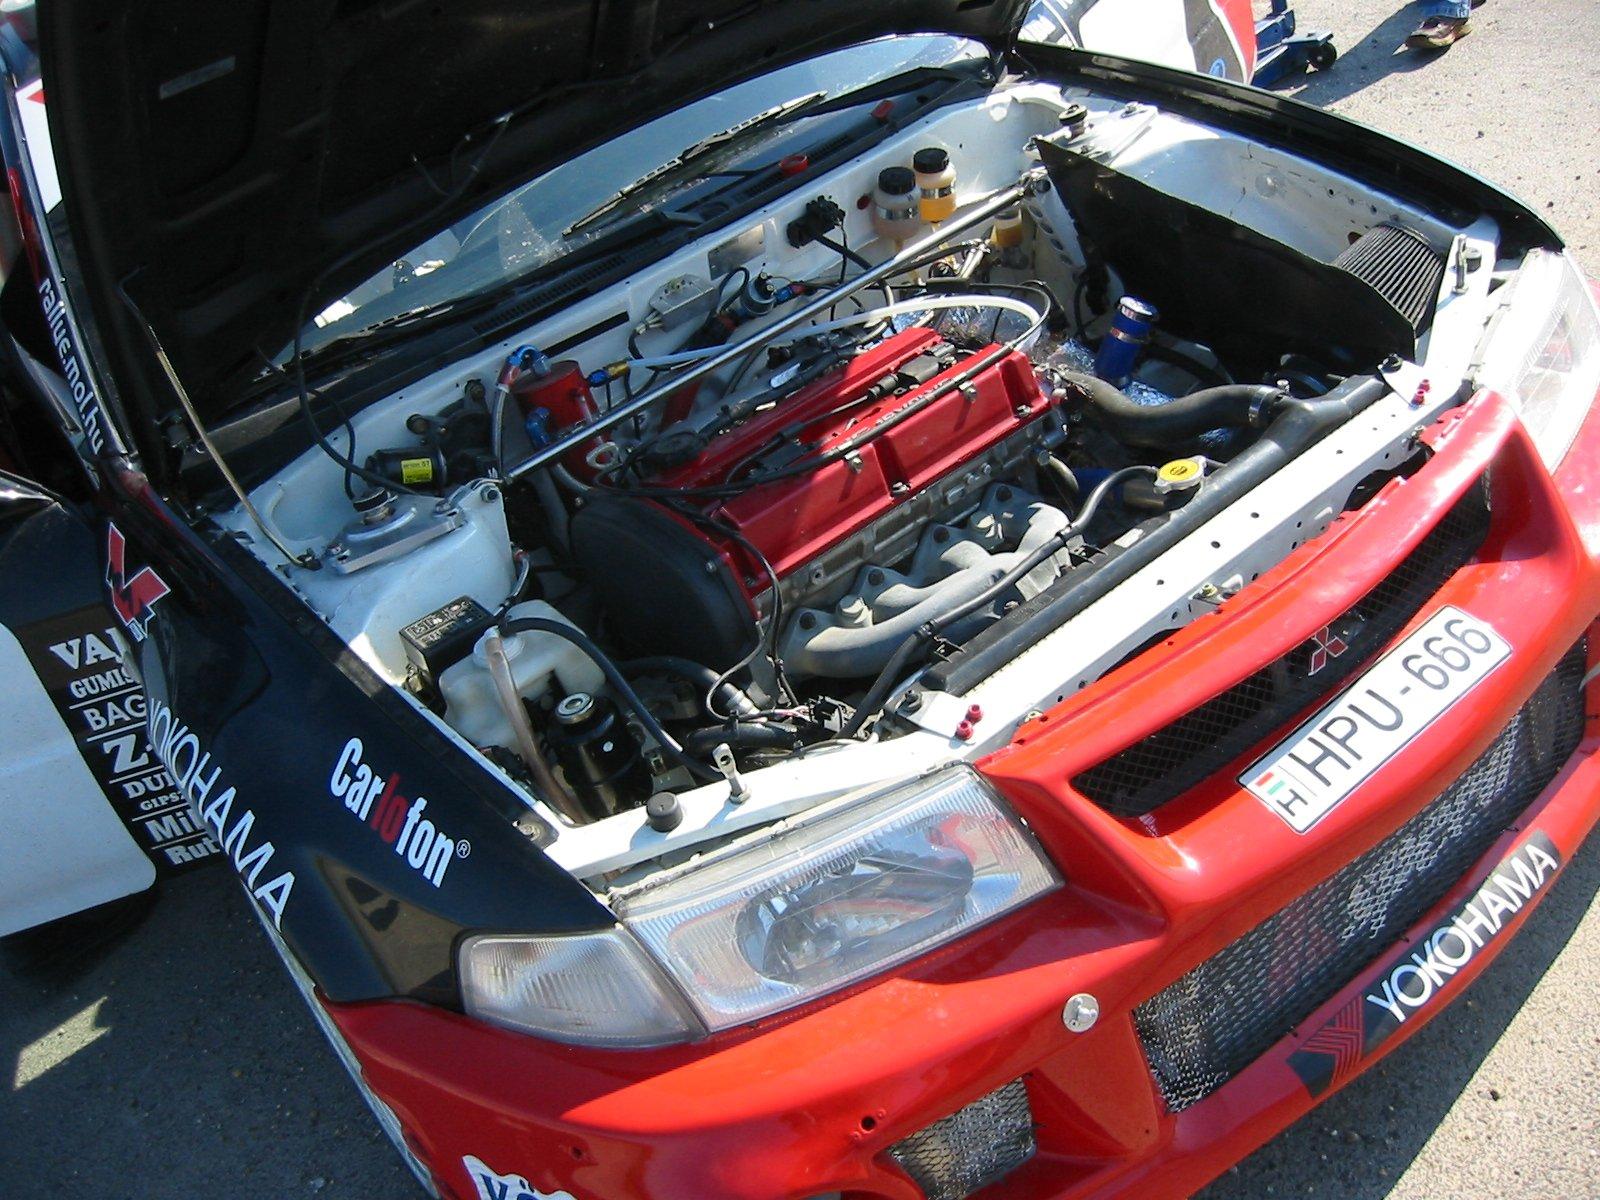 rallye racing car